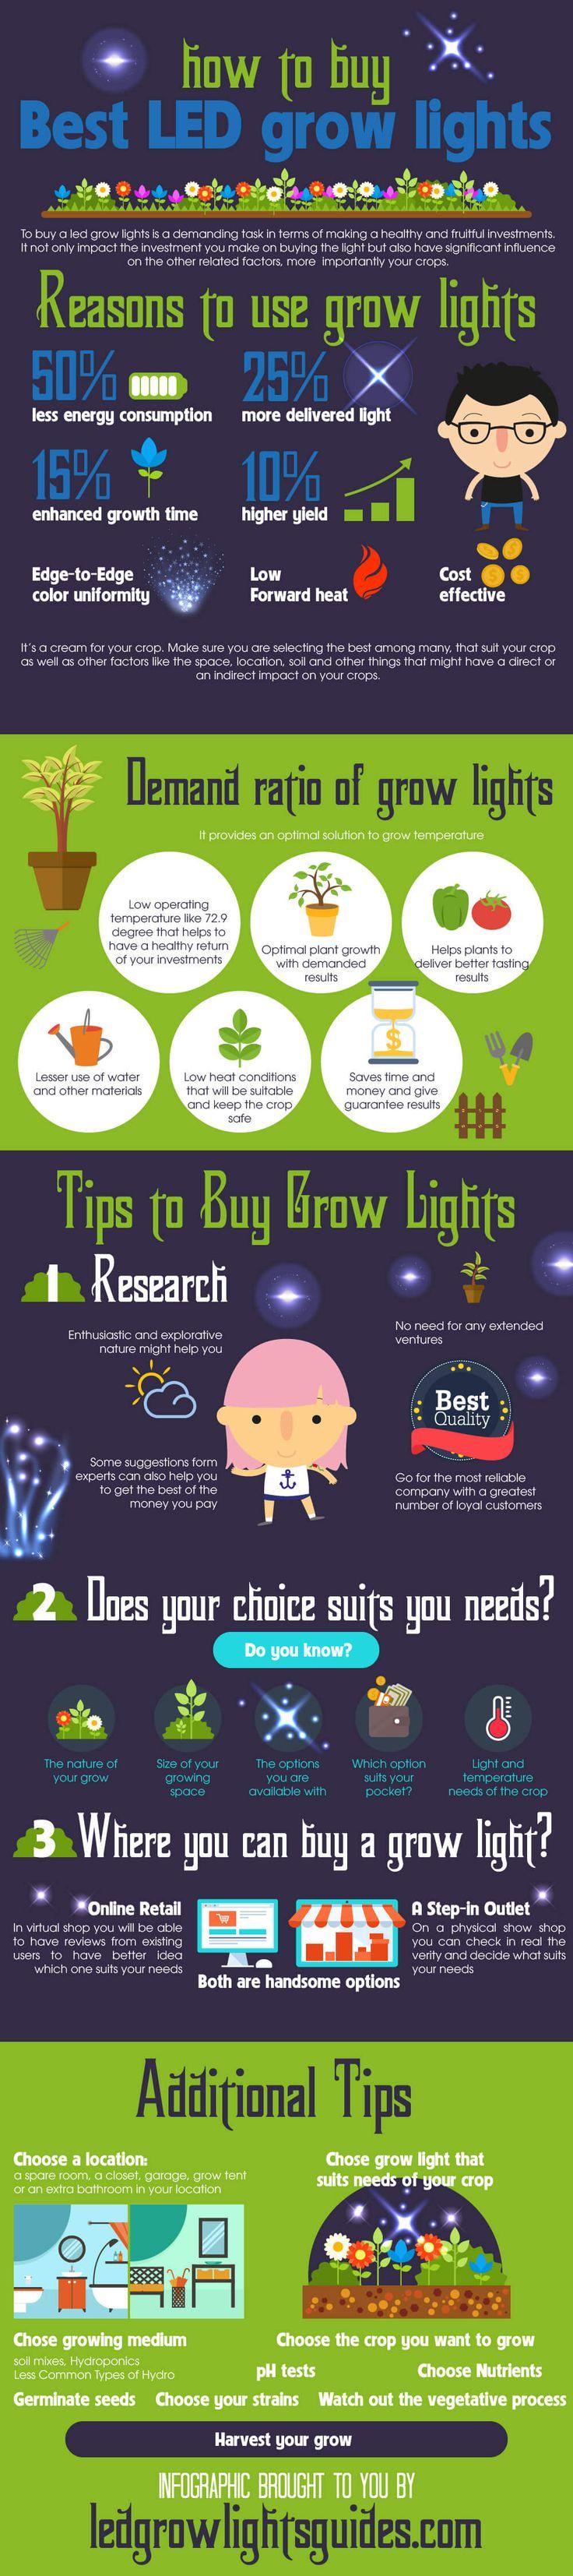 LED Grow light in-depth information